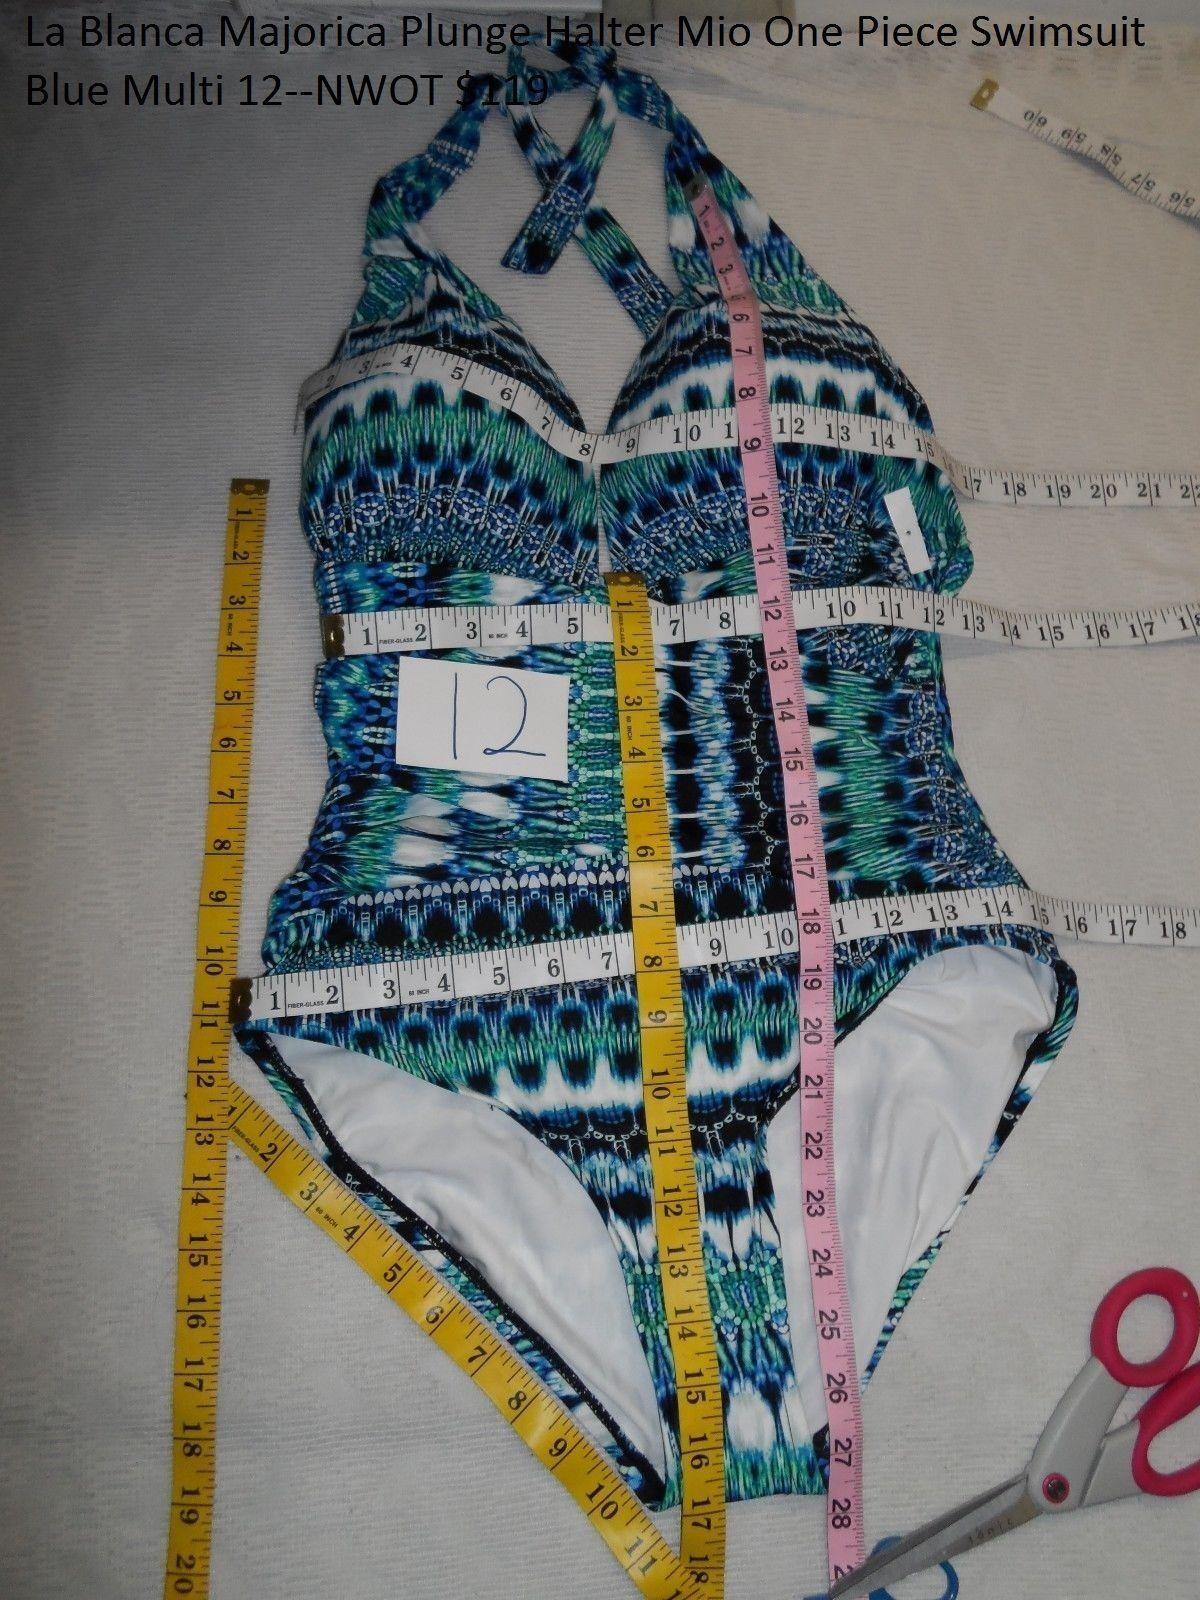 La whitea Majorica Plunge Halter Mio One Piece Swimsuit bluee Multi 12--NWOT